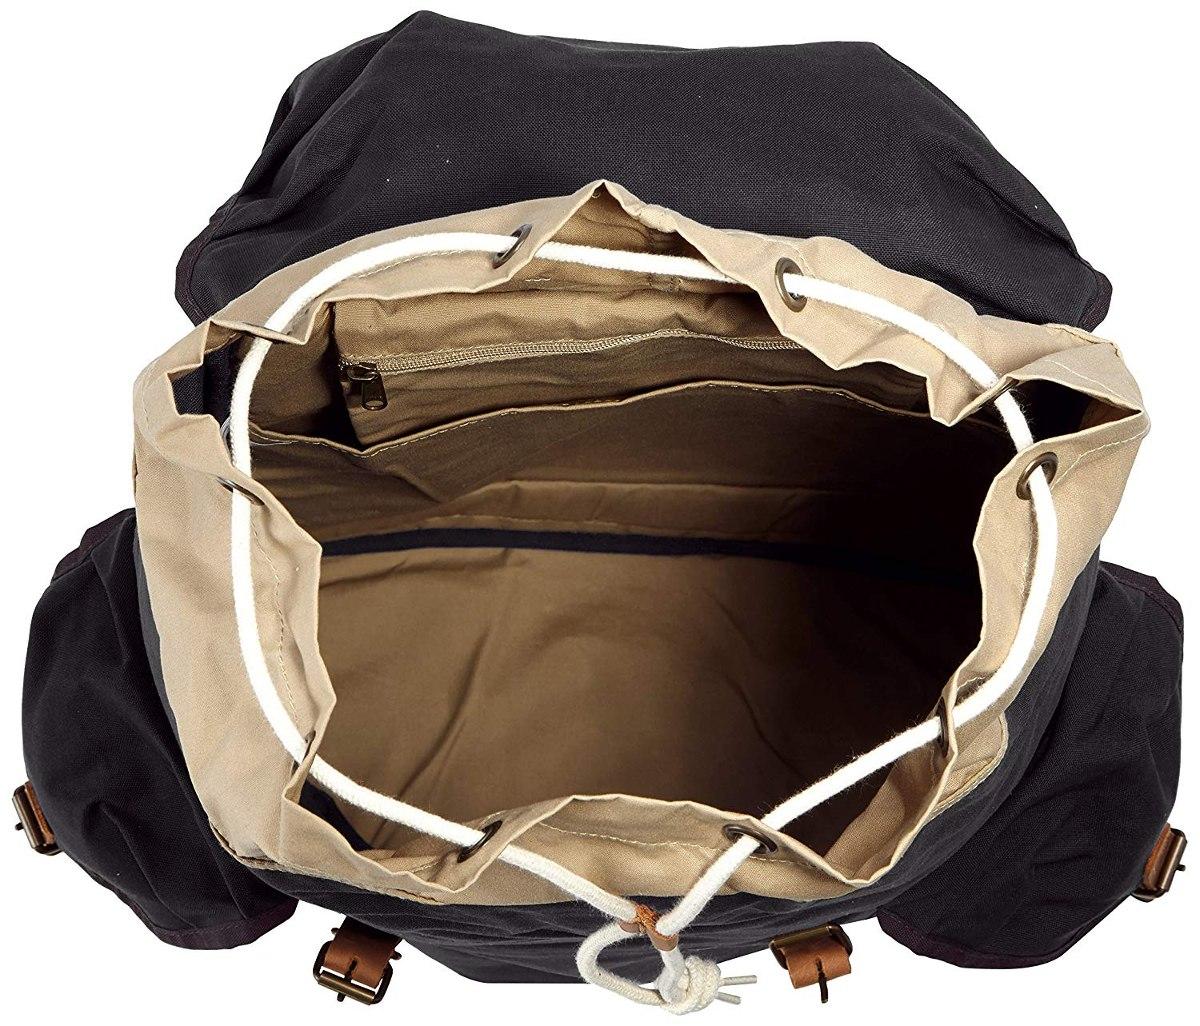 Flag Of Israel Beam Mouth Backpack Pull Rope Shoulder Bag Outdoor Sports Leisure Bag